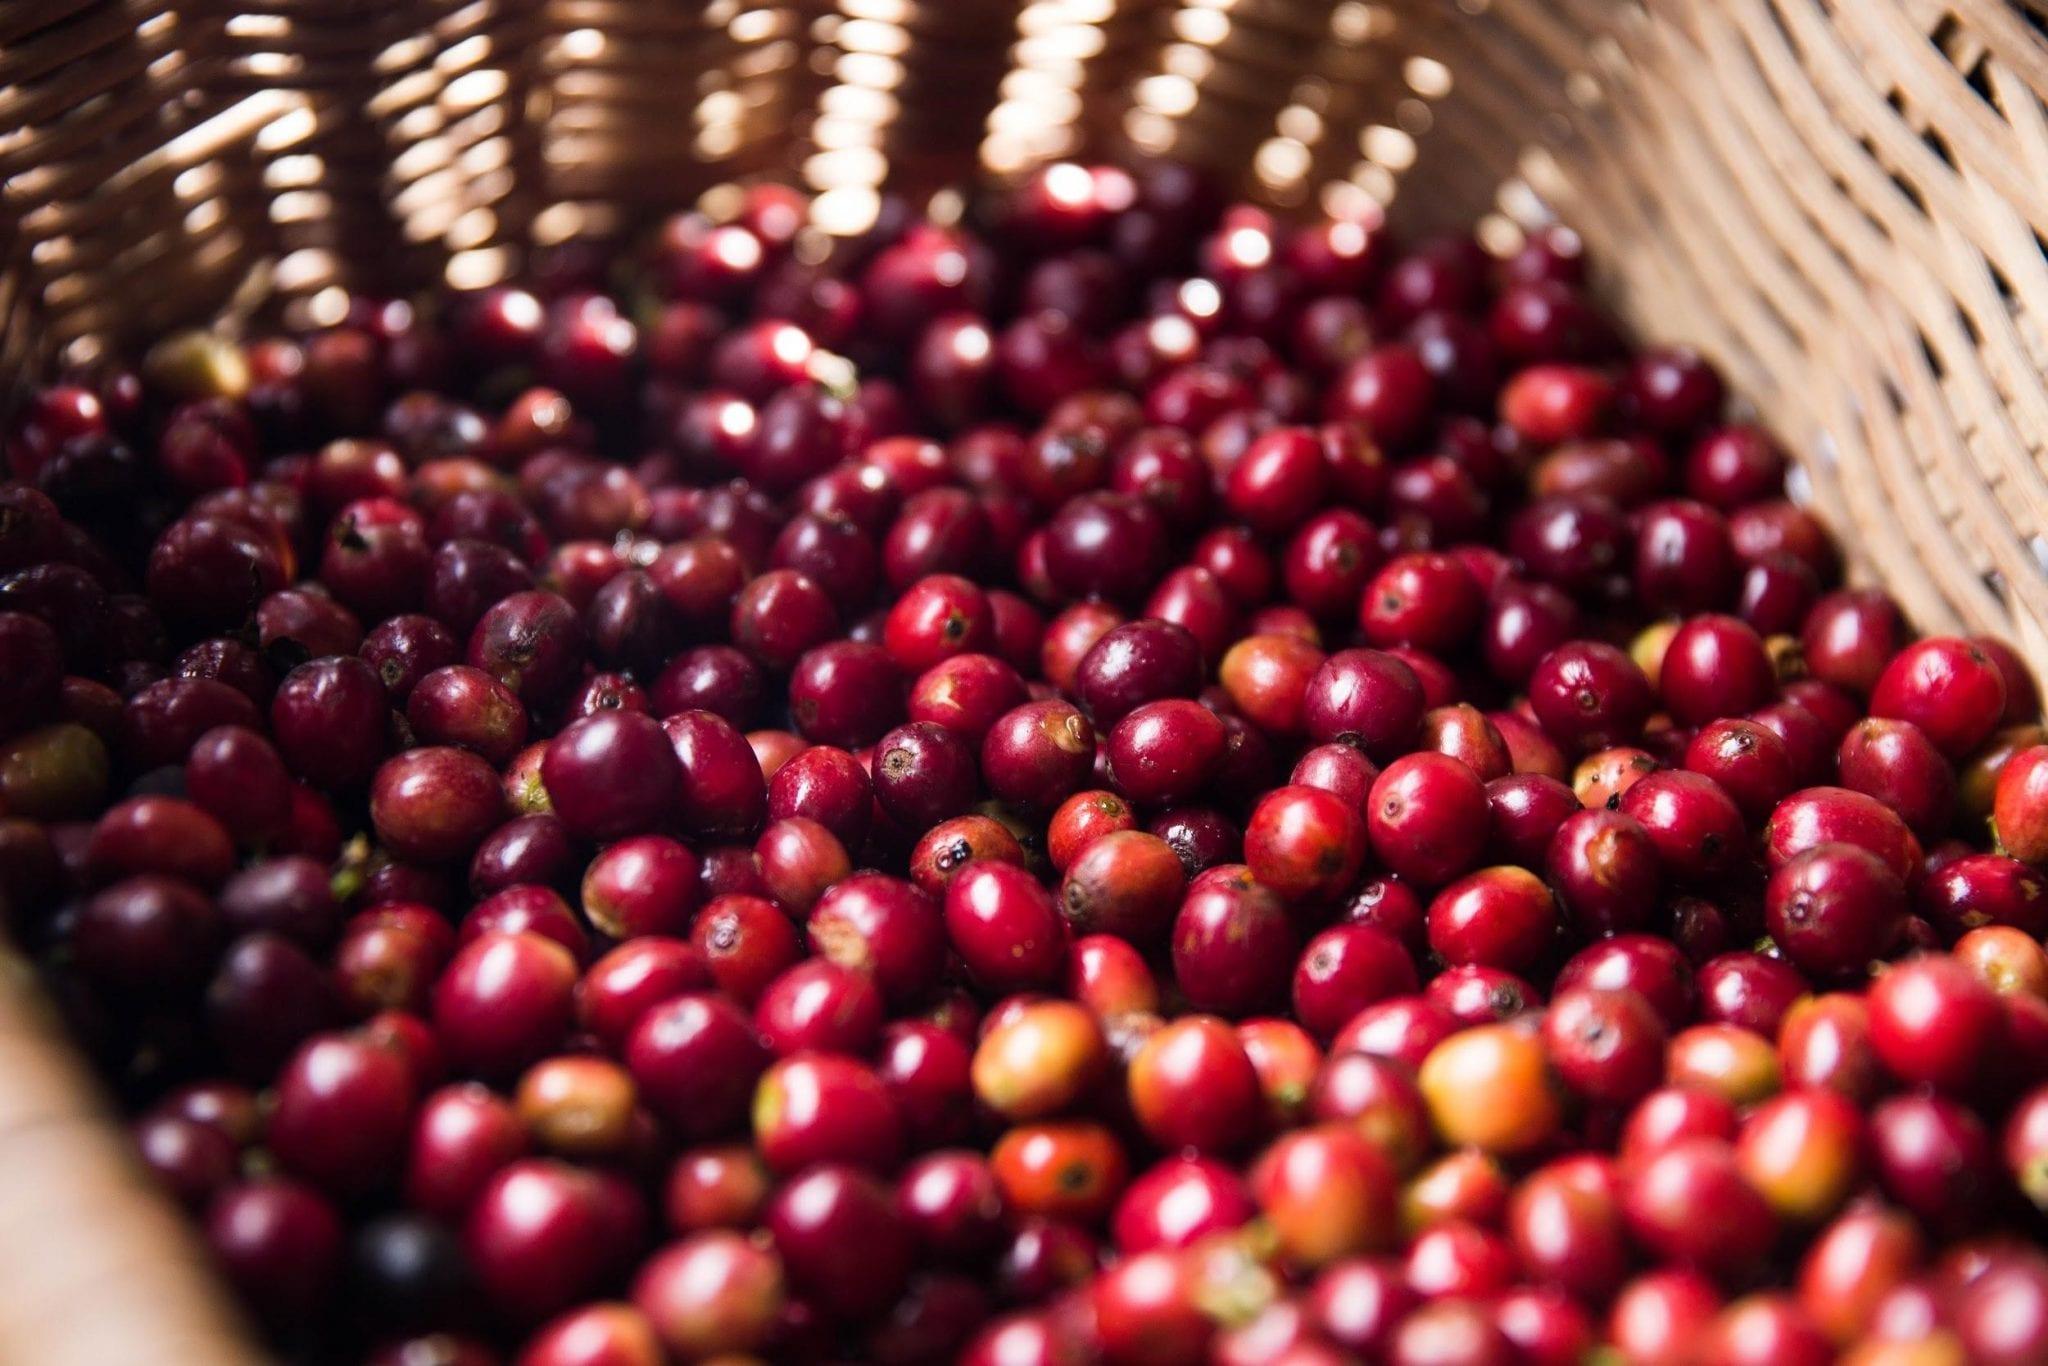 ripe coffee cherries in a bascket